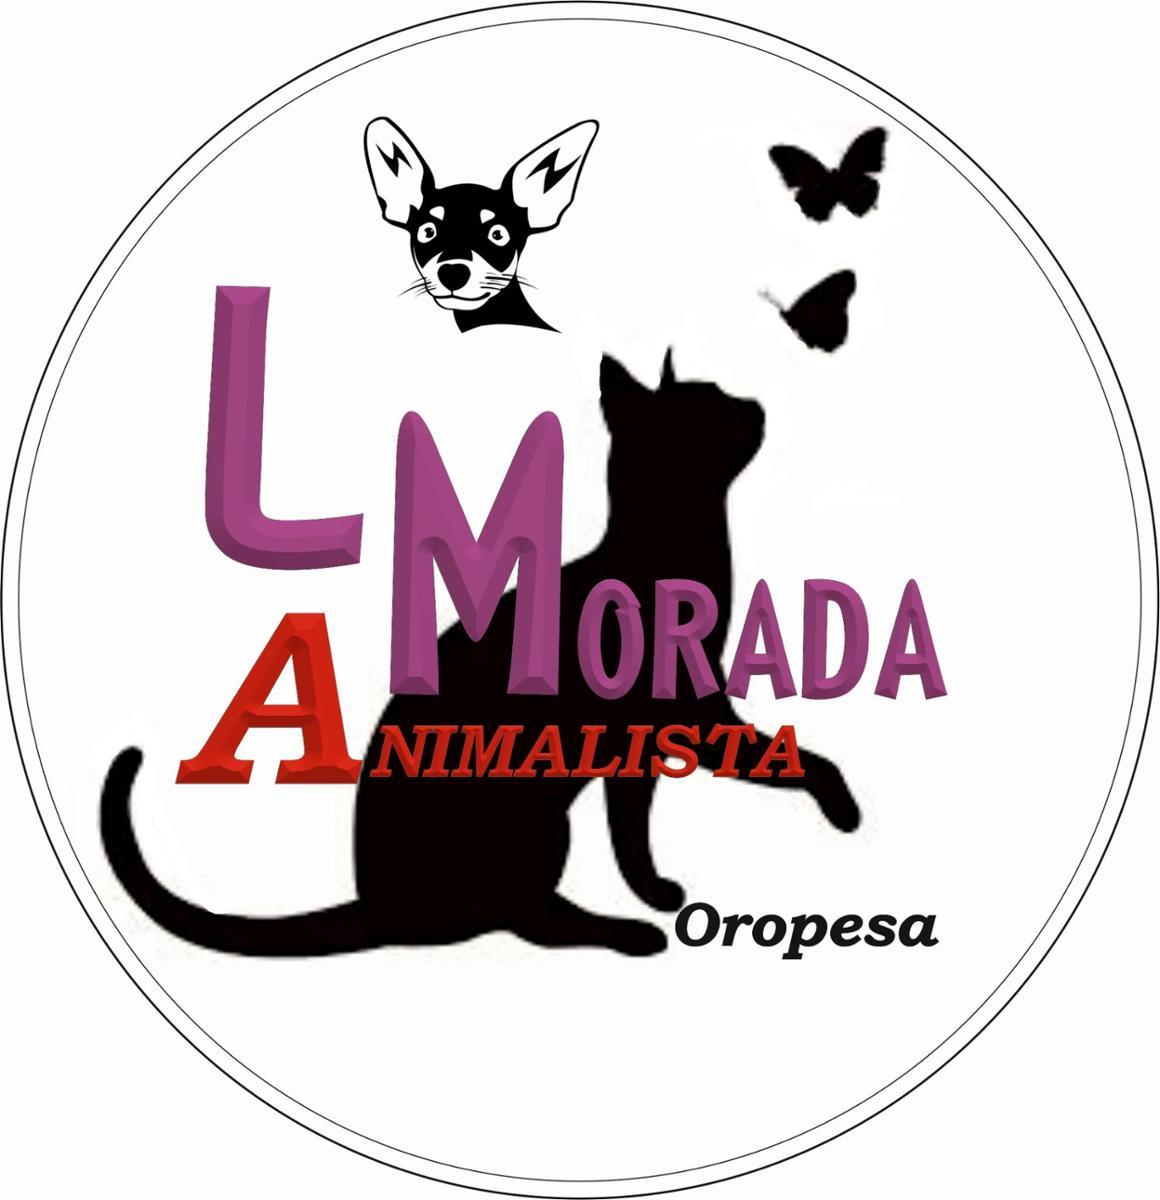 La Morada Animalista de Oropesa